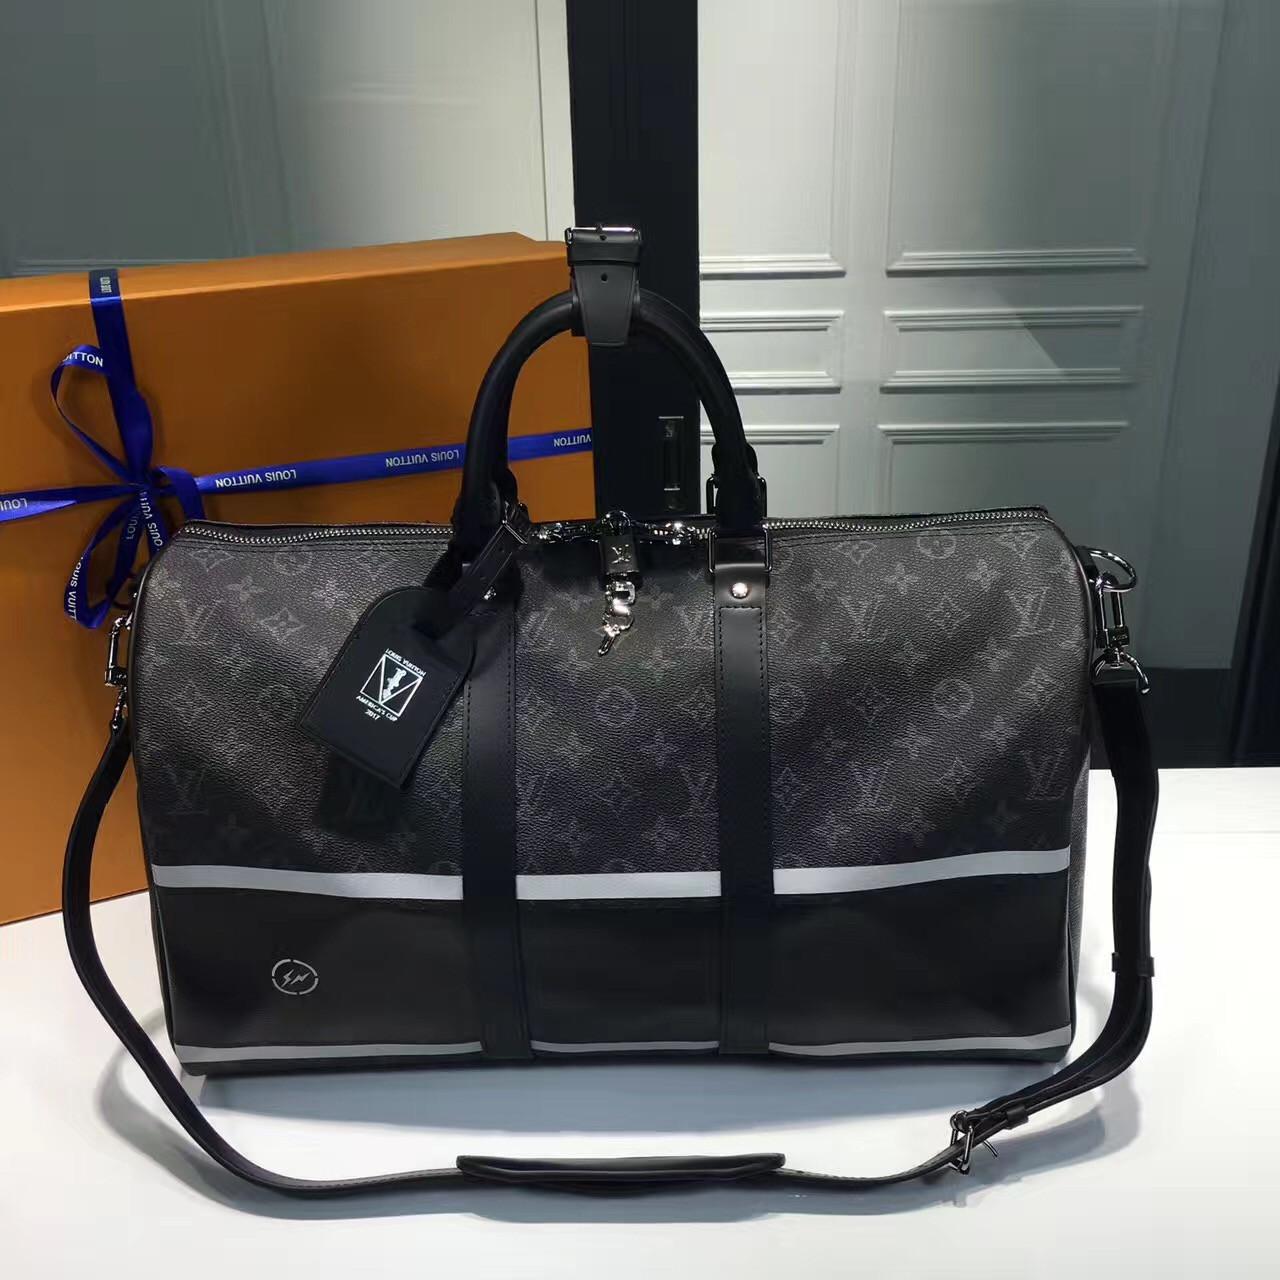 Louis Vuitton Keepall - дорожная сумка Луи Виттон   vkstore.com.ua fca1a43dbd6